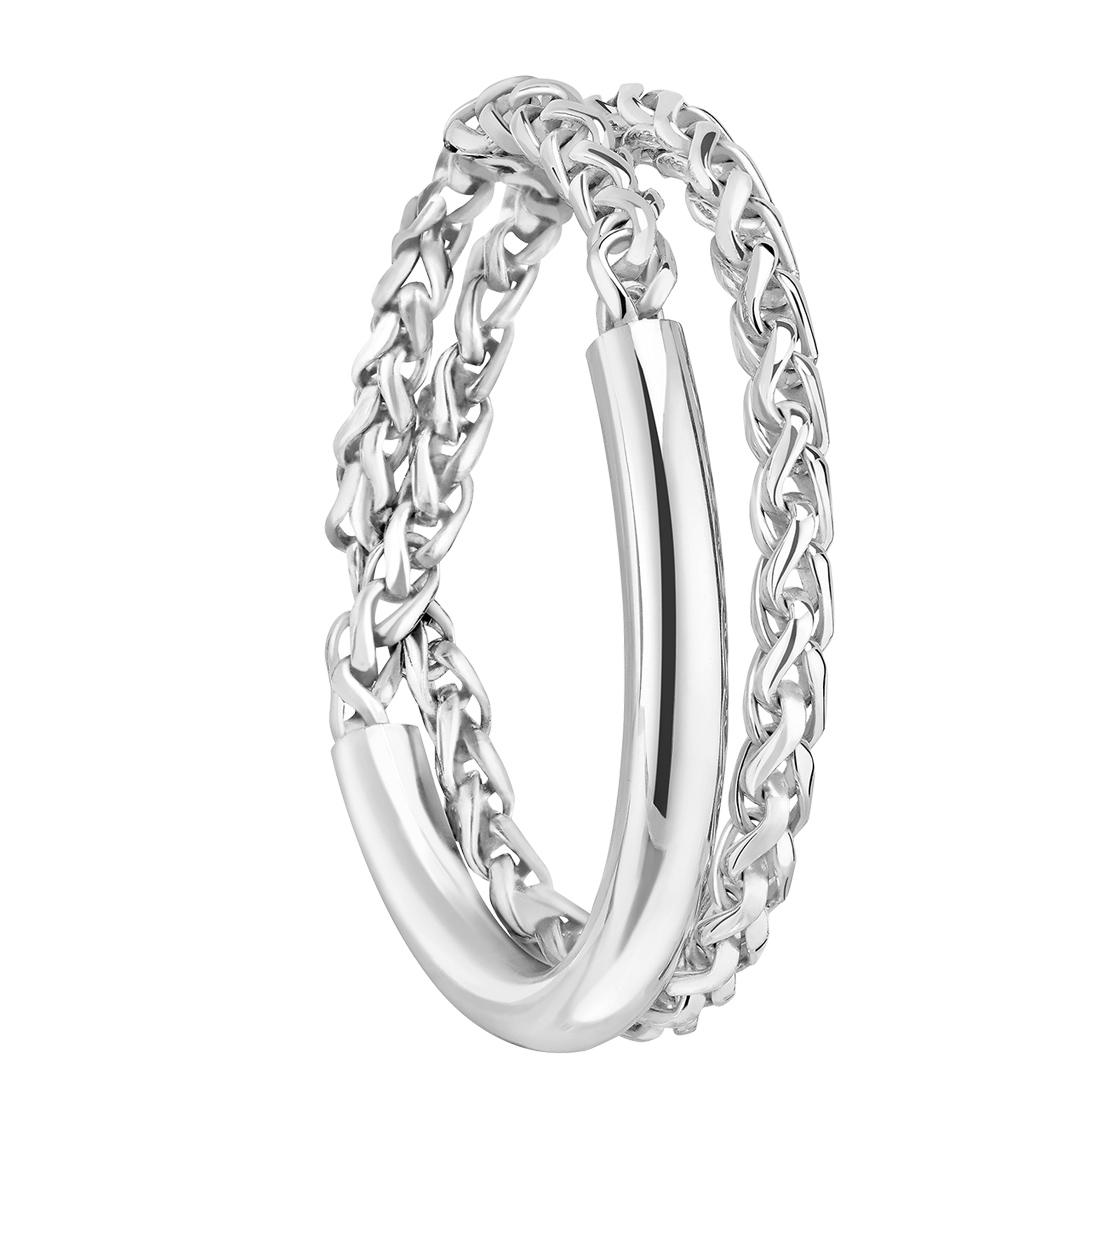 Bracelet S2 In Sterling Silver Christofle